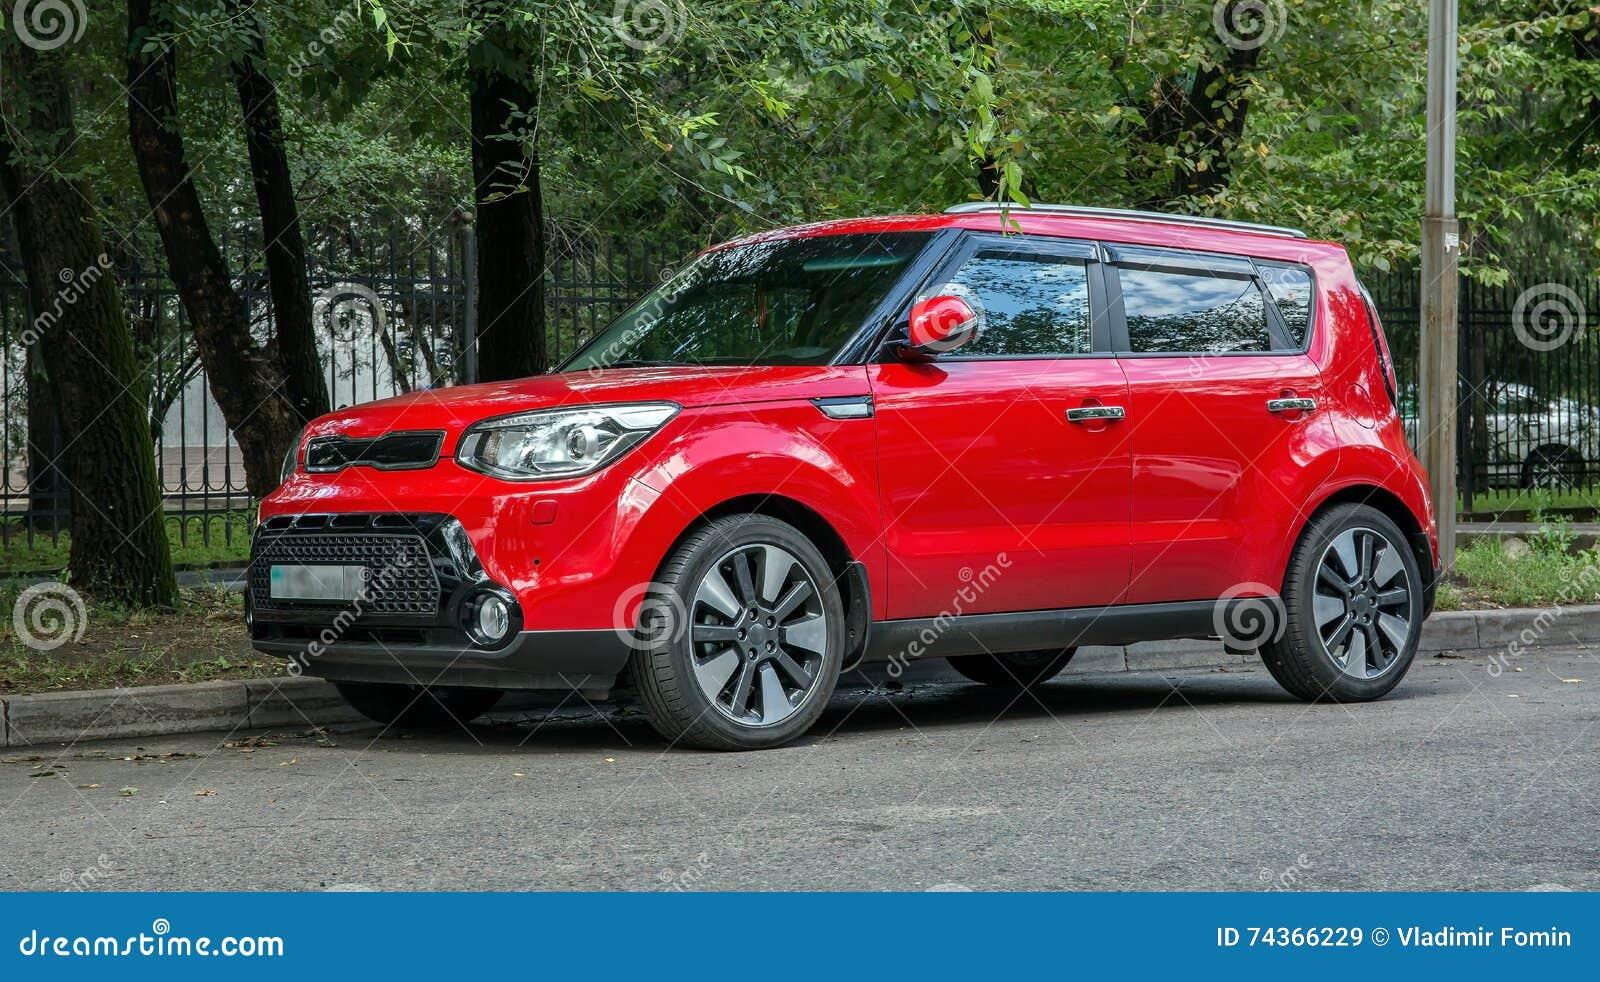 Red Car Kia Stock Photo Image 74366229